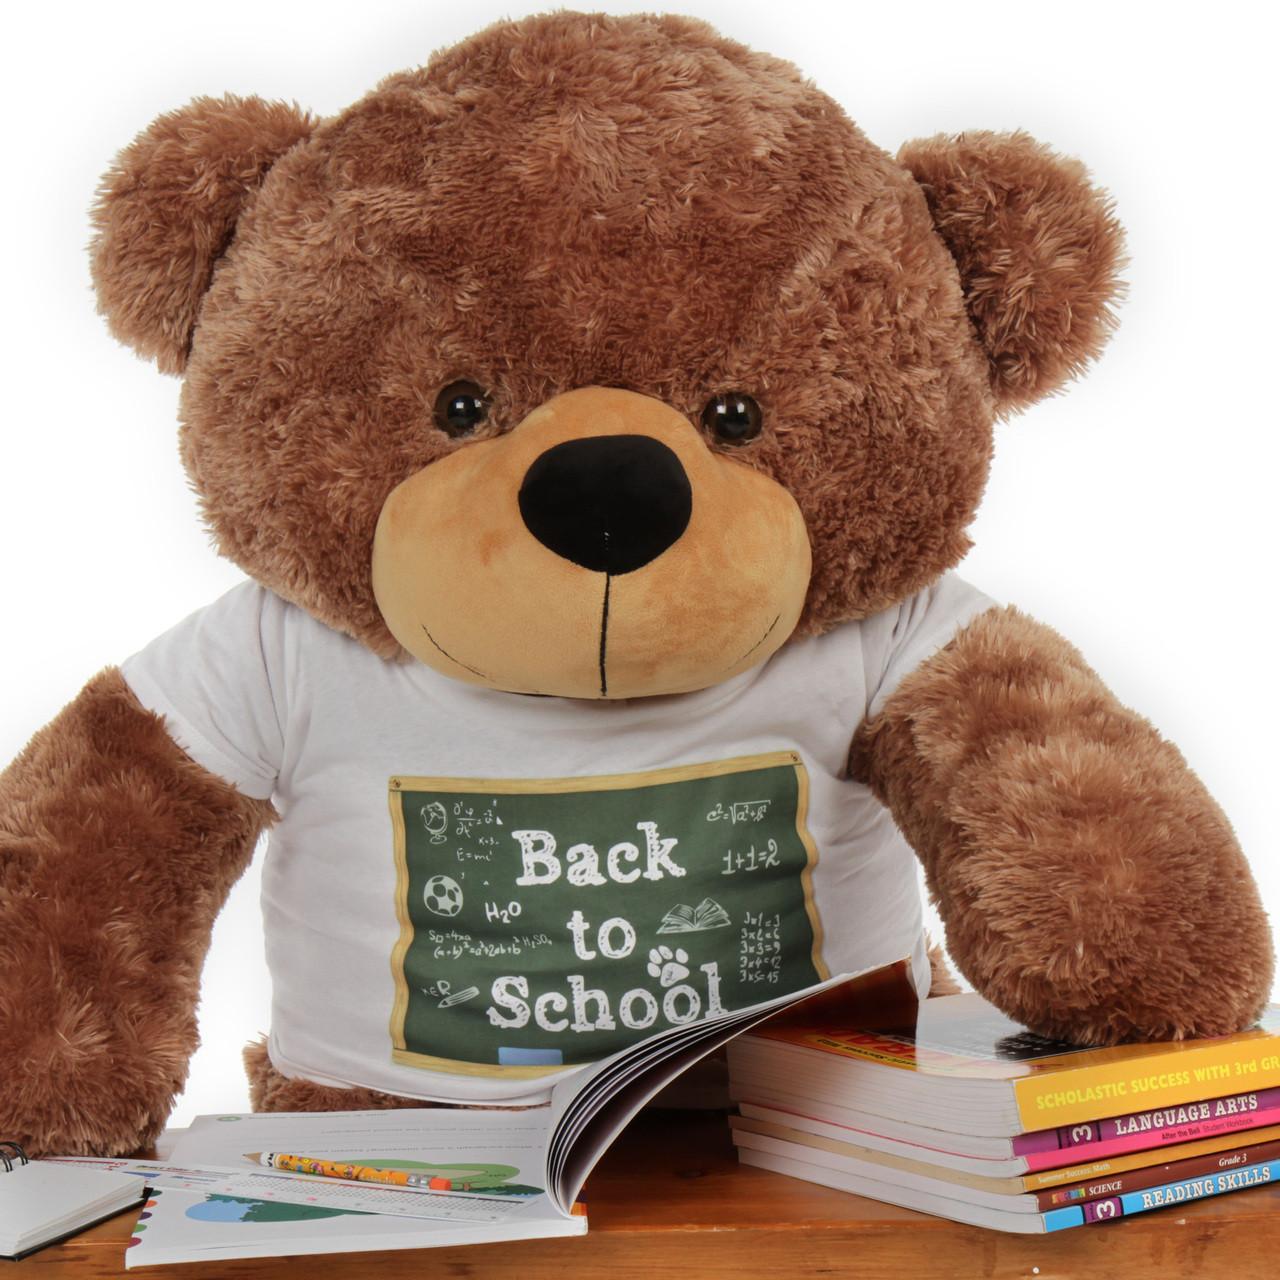 Super Soft Huge Back to School Teddy Bear by Giant Teddy Brand